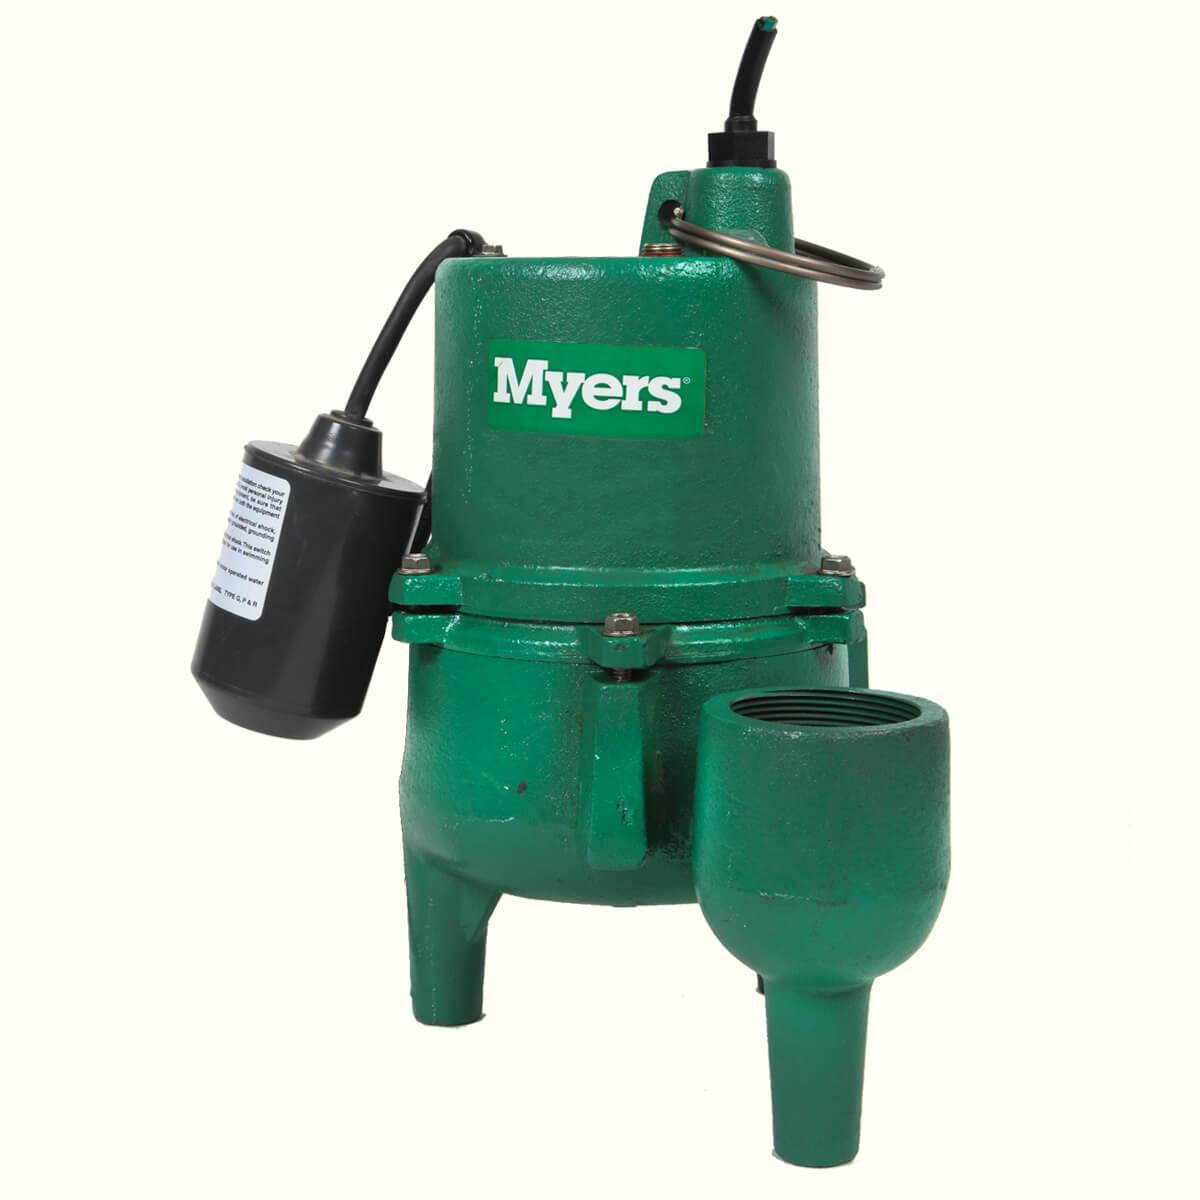 Myers Residential Sewage Pump - SRM4PC-1